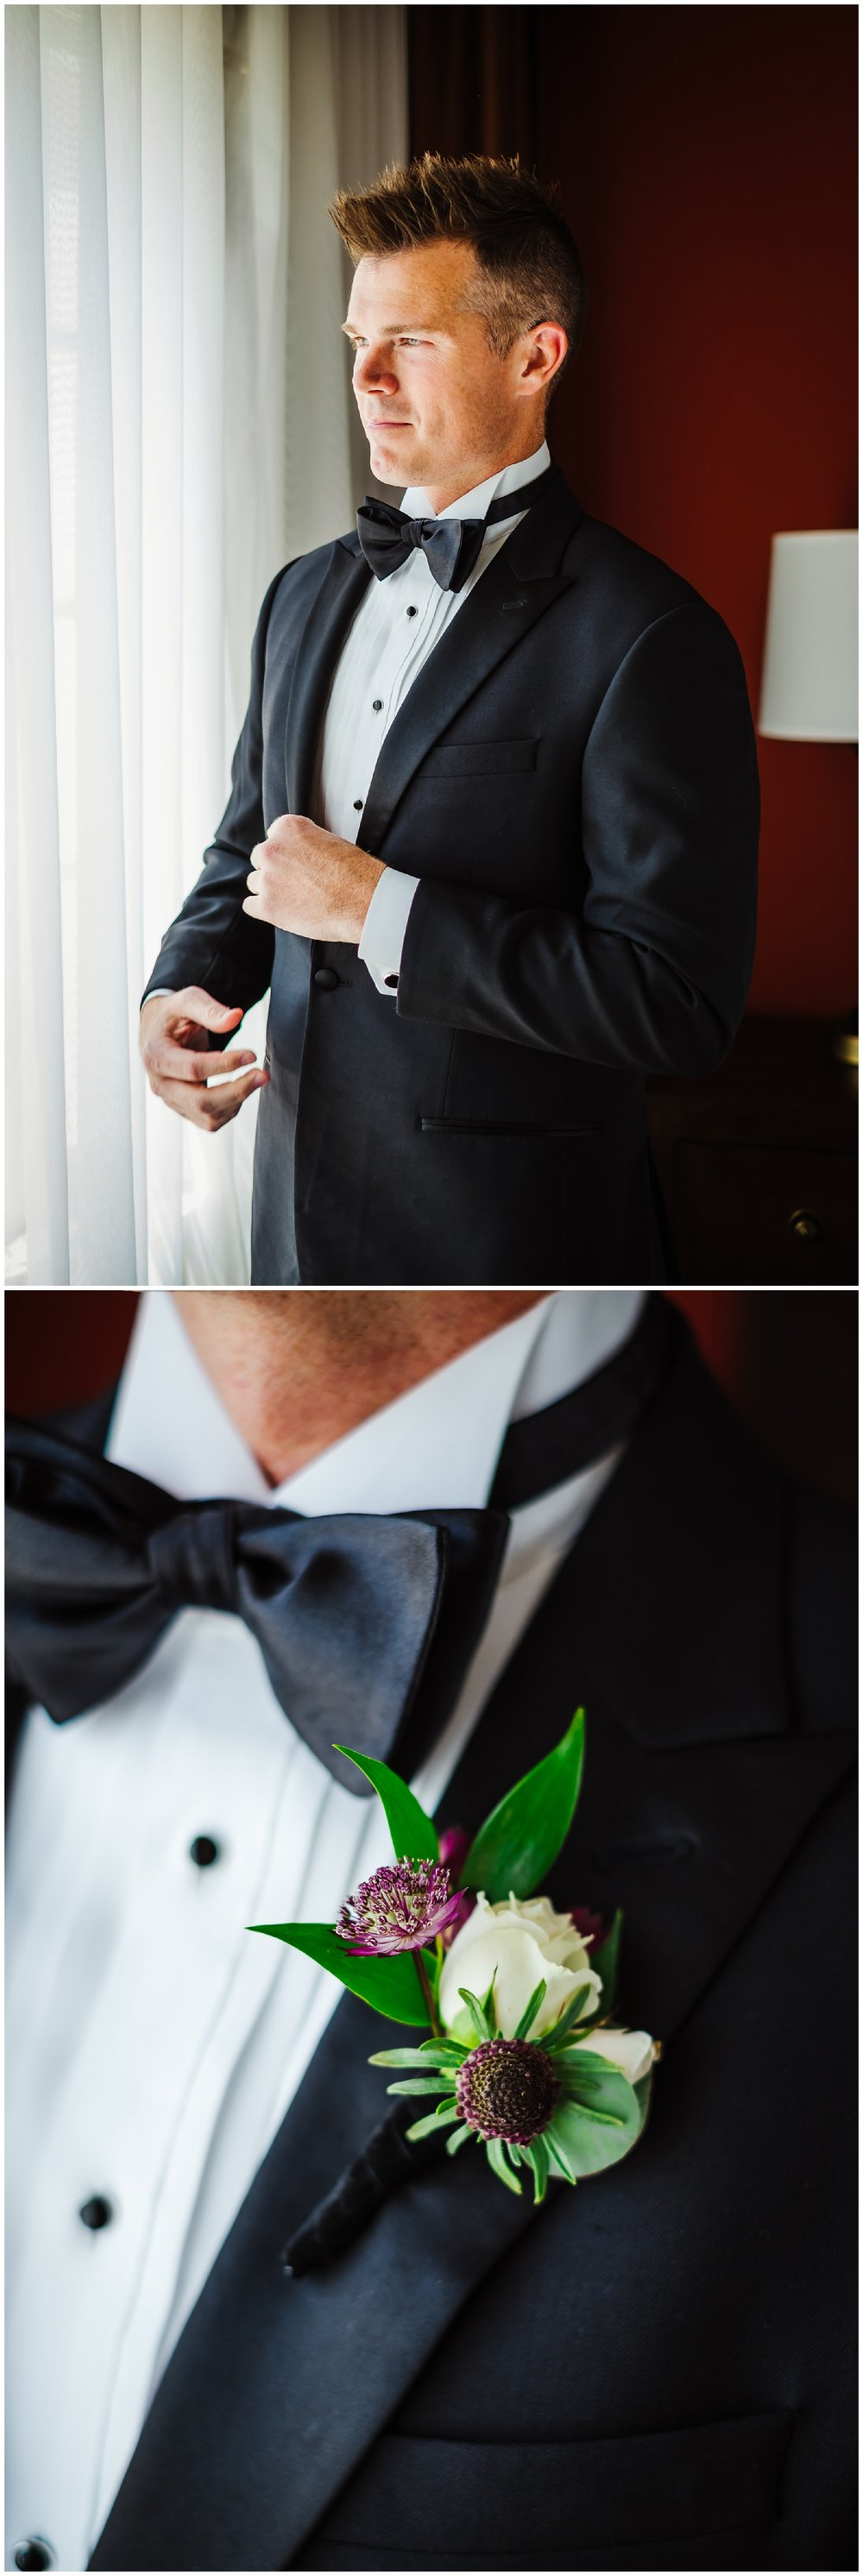 tampa-bradenton-wedding-photographer-south-florida-museum-classic-blush-gold-alpacas-sparklers_0022.jpg